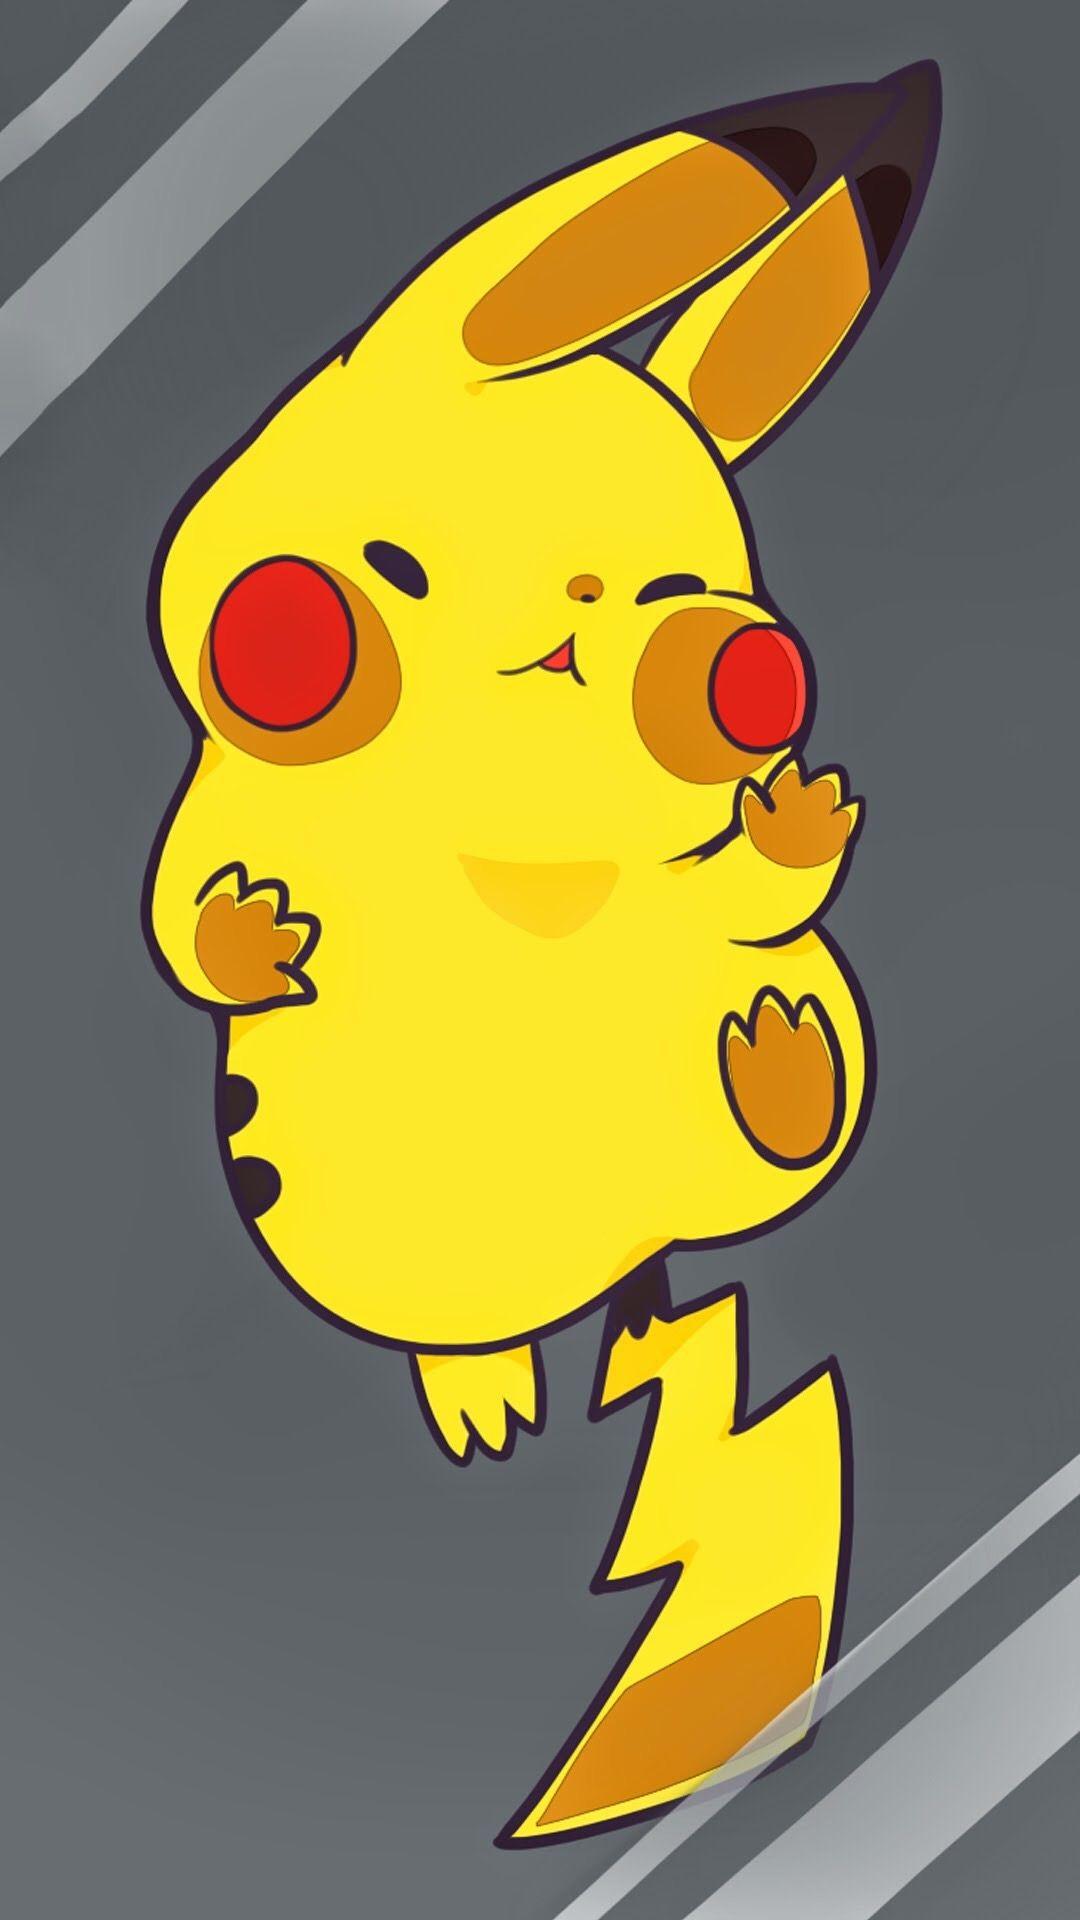 Res: 1080x1920, Tap image for more iPhone 6 Plus Pikachu wallpapers! Pikachu - @mobile9 | Cute  wallpapers for iPhone 5/5s, iPhone 6 & iPhone 6 plus #kawaii #chibi #pokemon